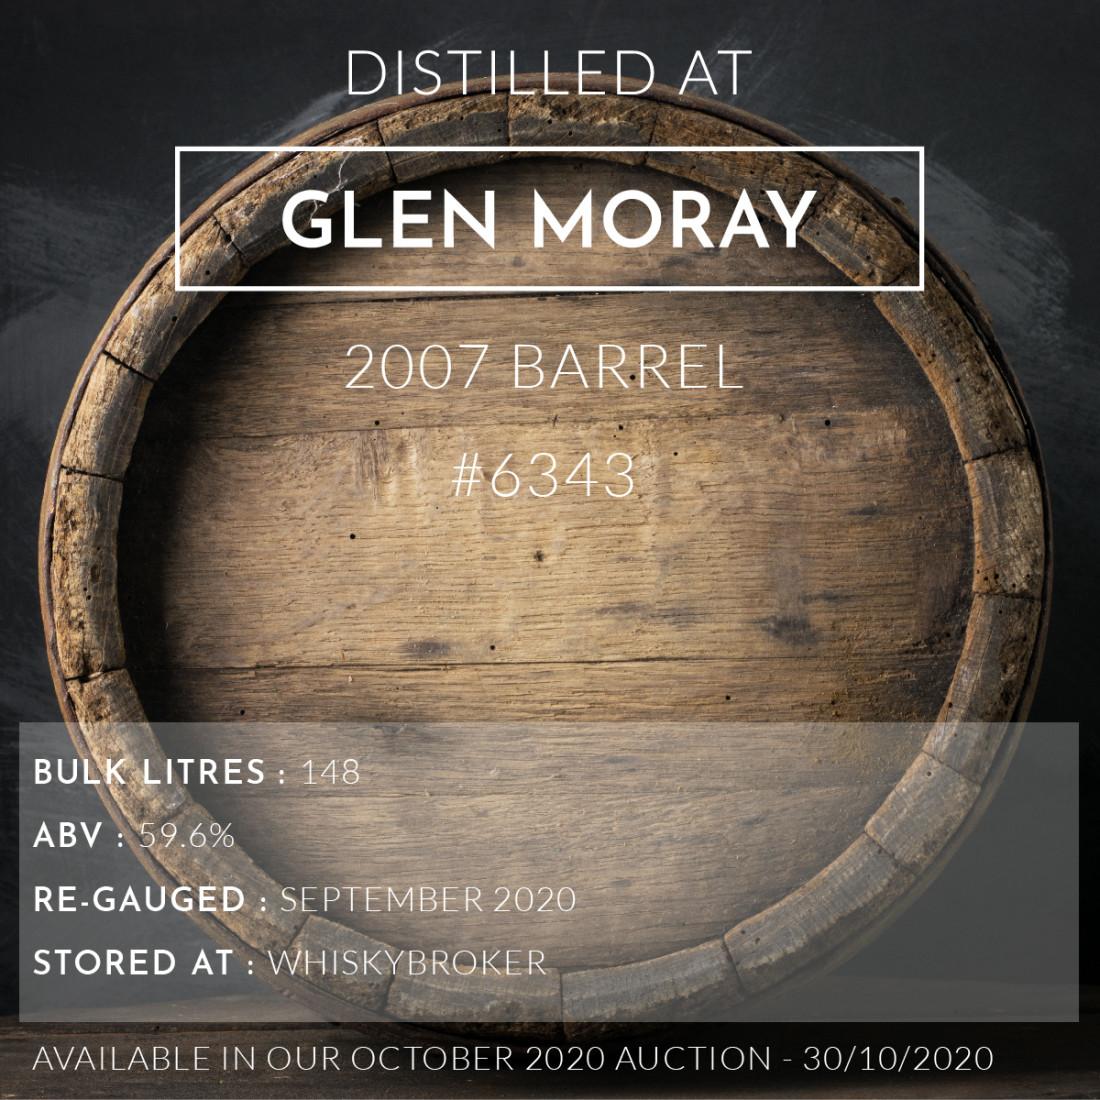 Glen Moray 2007 Barrel #6343 / Cask in storage at Whiskybroker